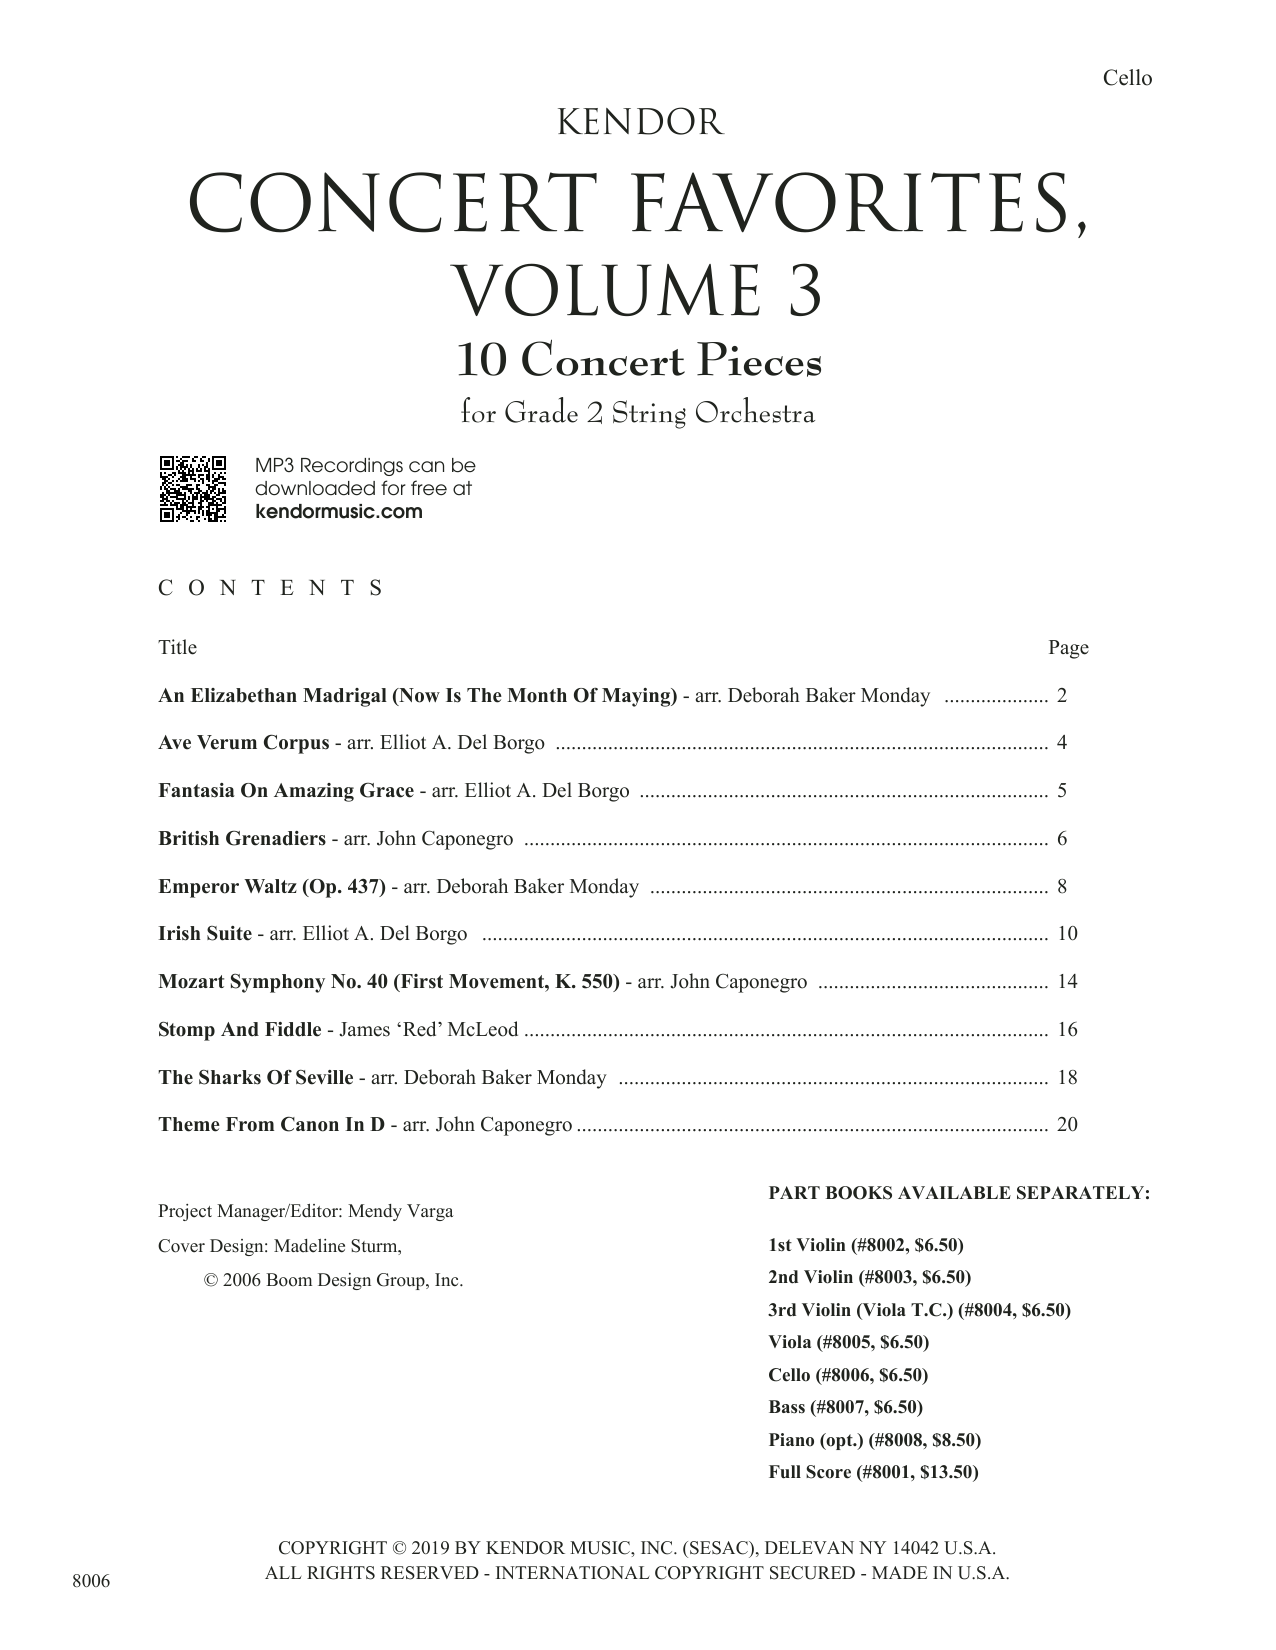 Kendor Concert Favorites, Volume 3 - Cello Sheet Music